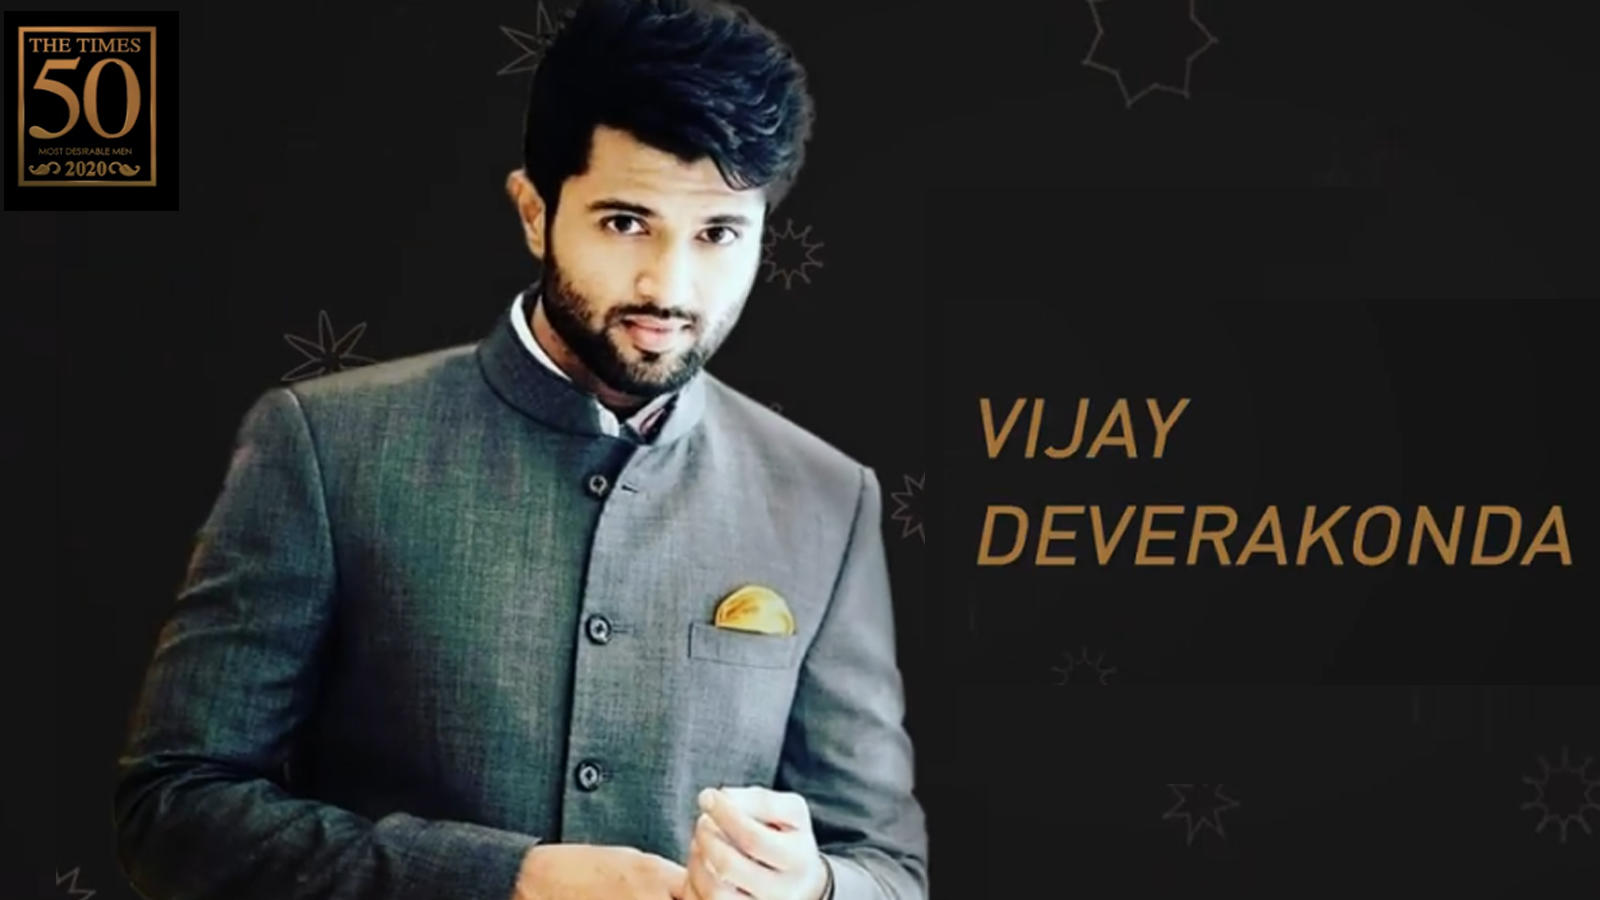 Vijay Deverakonda wins the top spot on the Hyderabad Times Most Desirable Men's list 2020   Hindi Movie News – Bollywood – Times of India